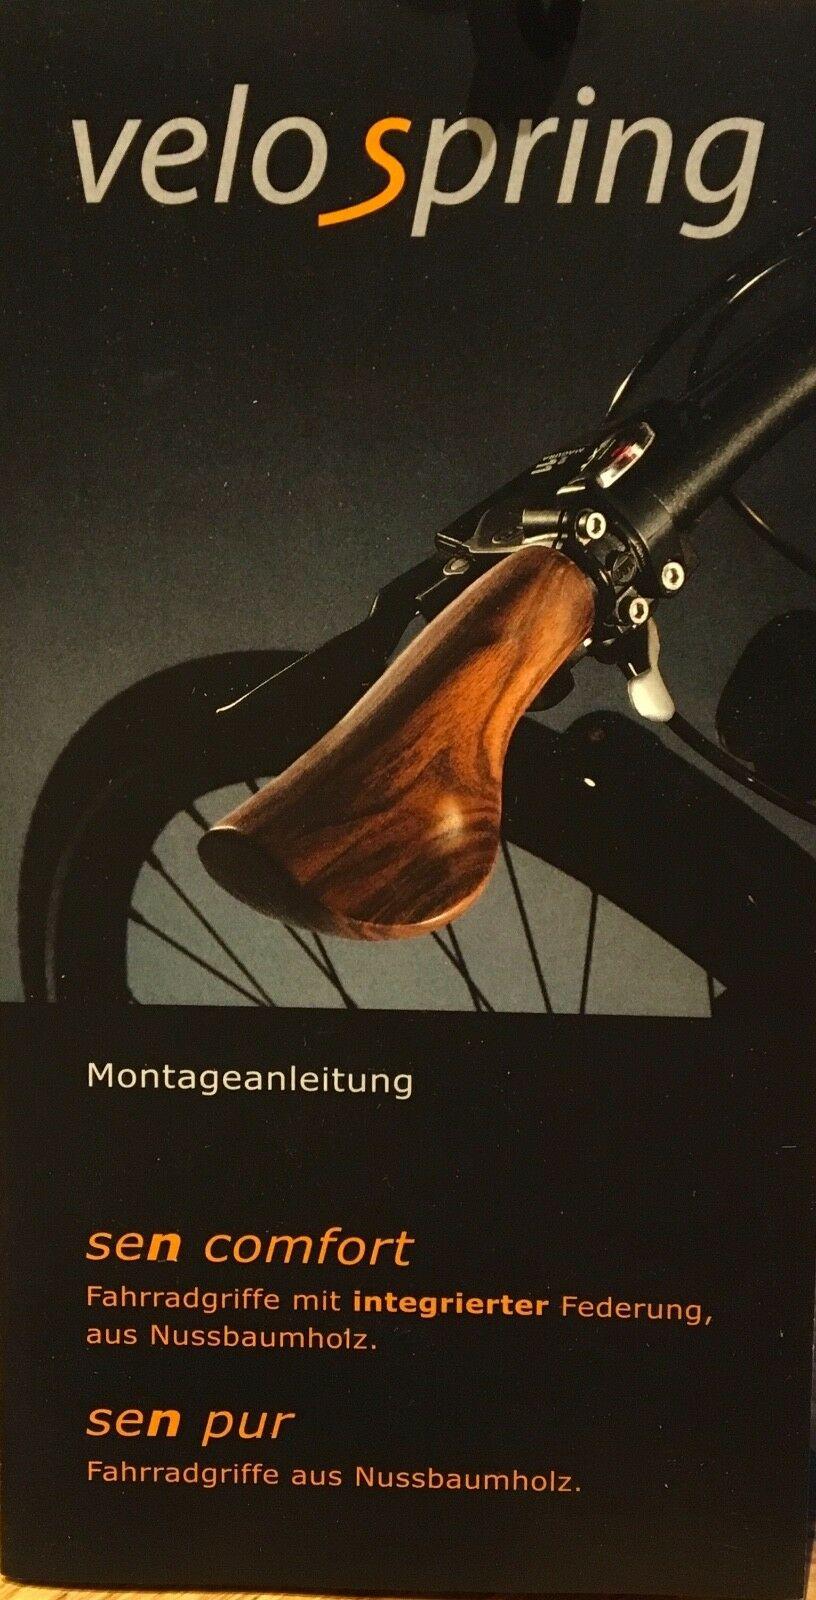 VELOSPRING Lenkergriffe sen comfort Nussbaumholz mit Federung lang//lang Rohloff